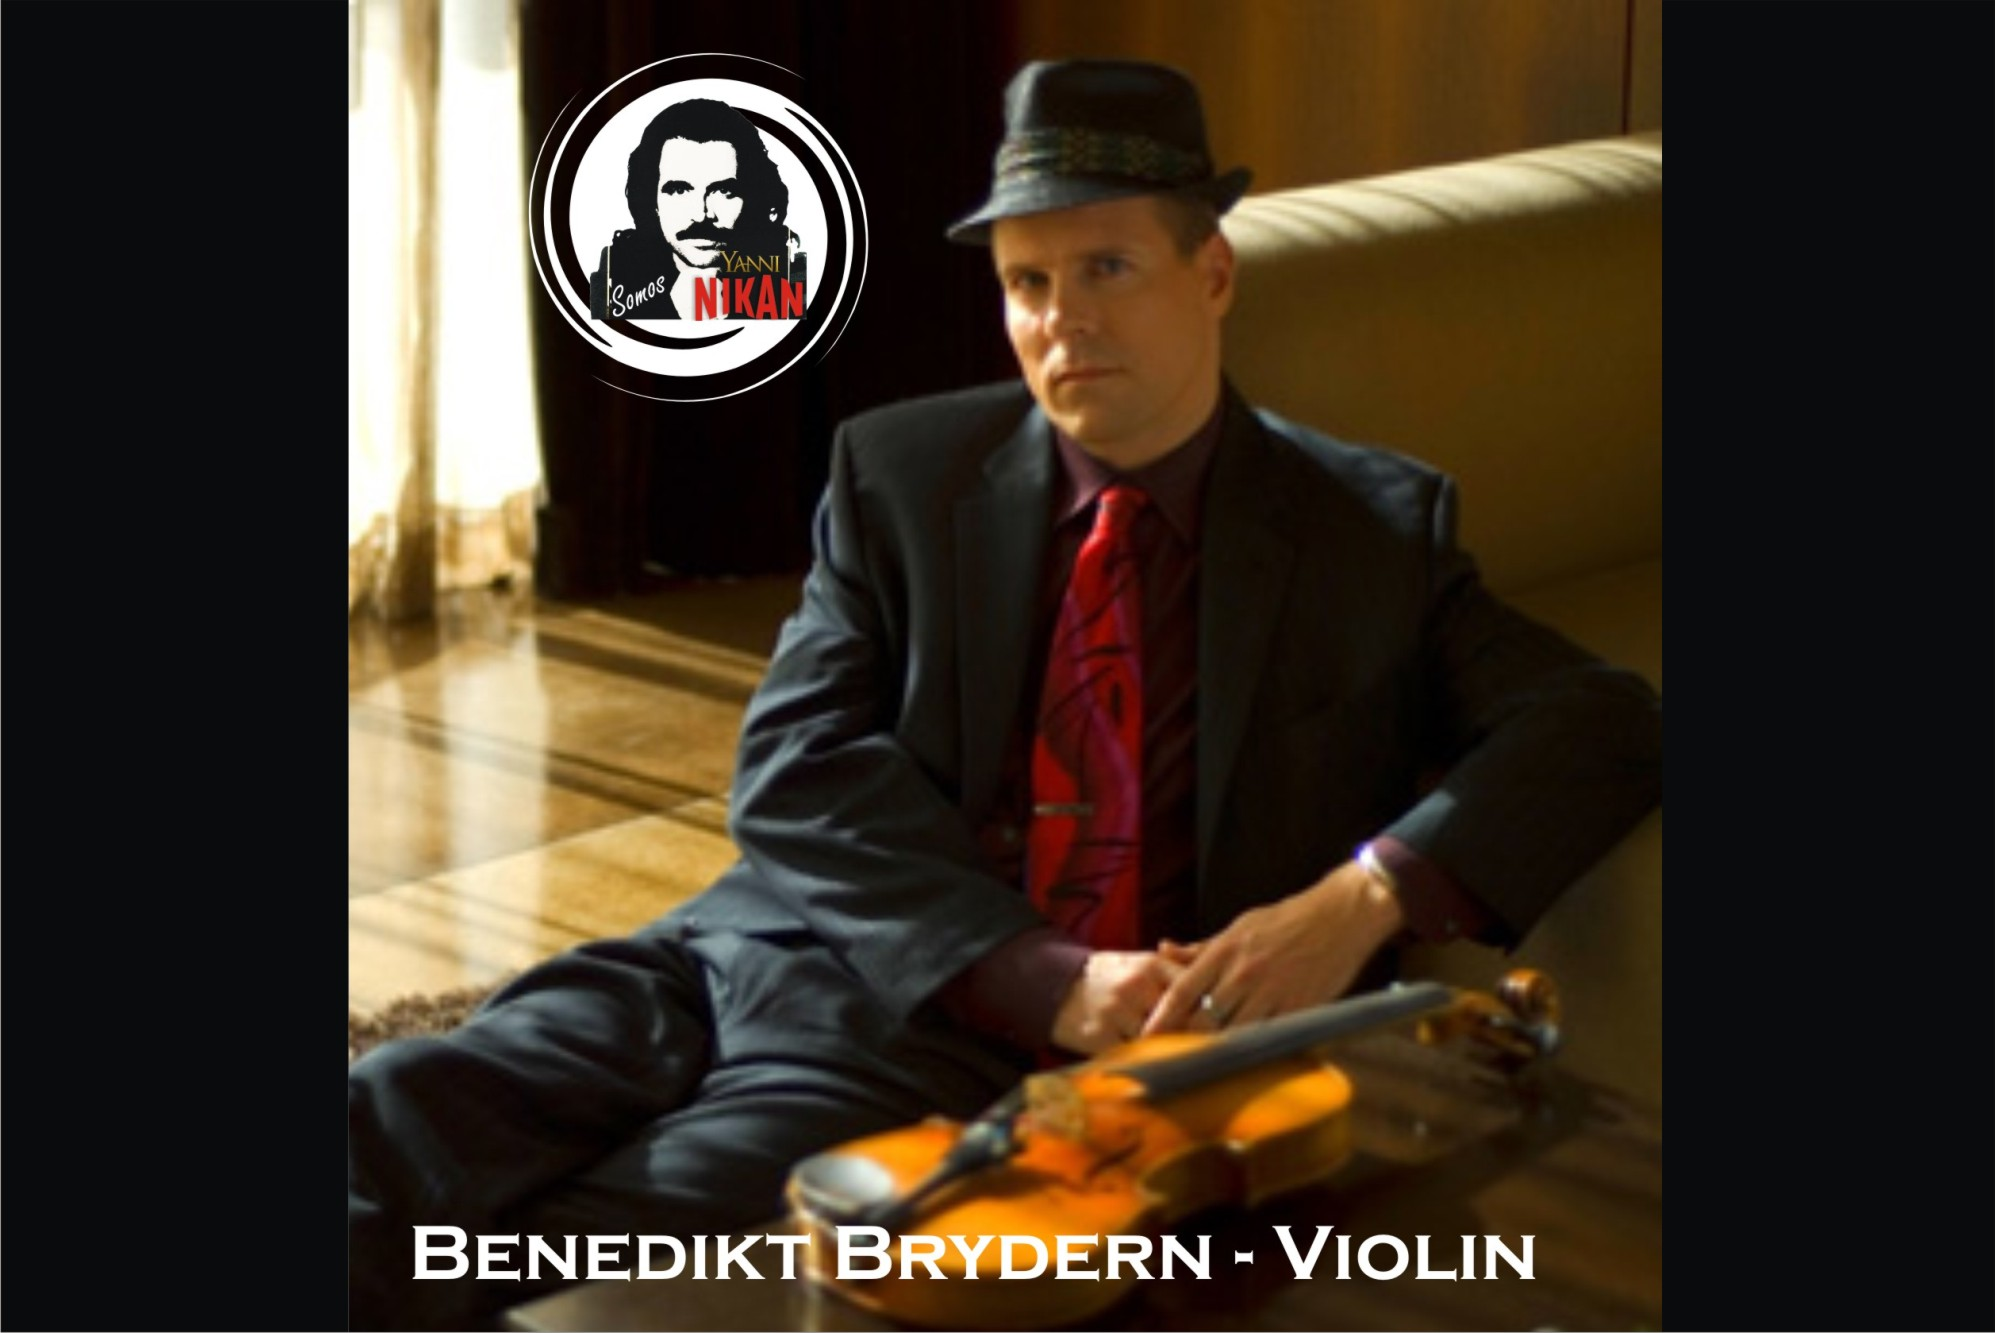 Benedikt Brydern